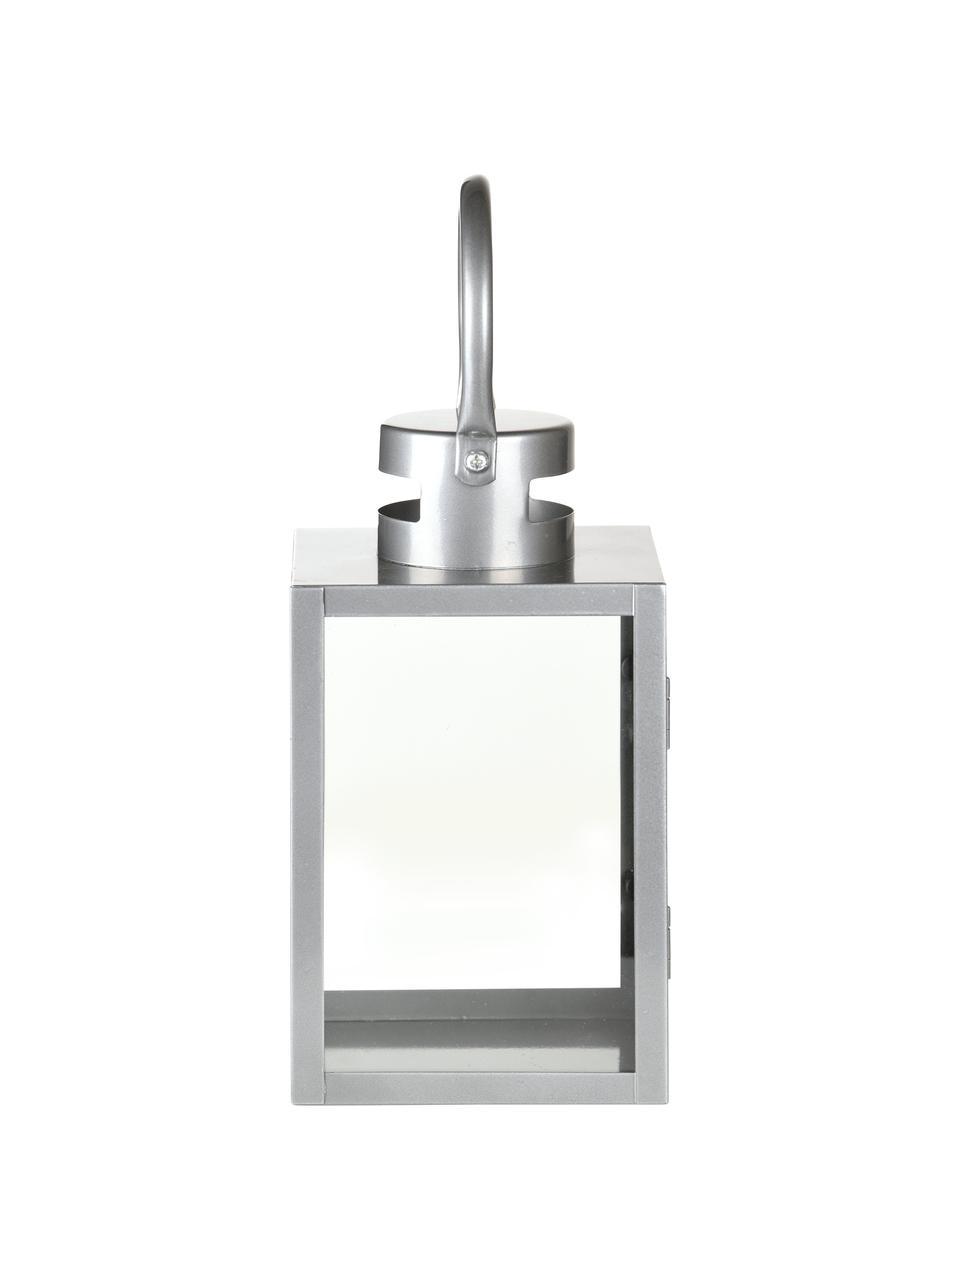 Wandlantaarn Shine, Zilverkleurig, 14 x 23 cm